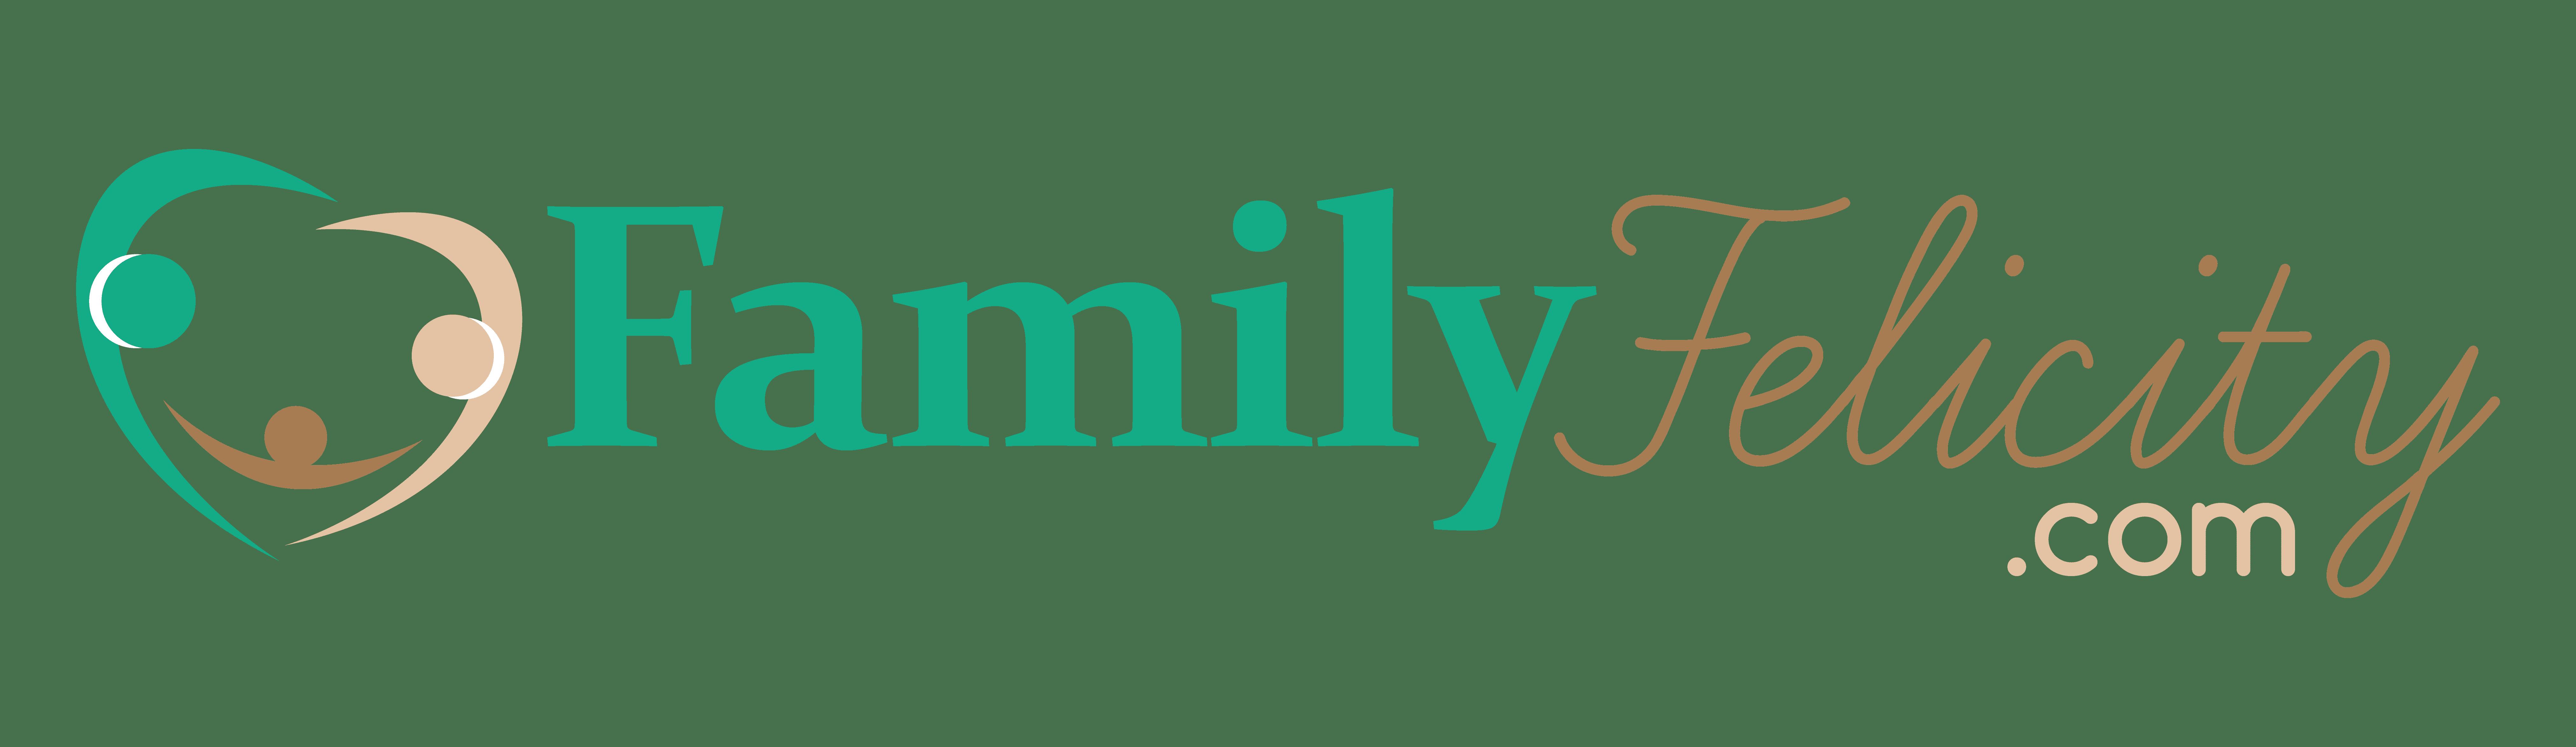 FamilyFelicity_500ppi-01